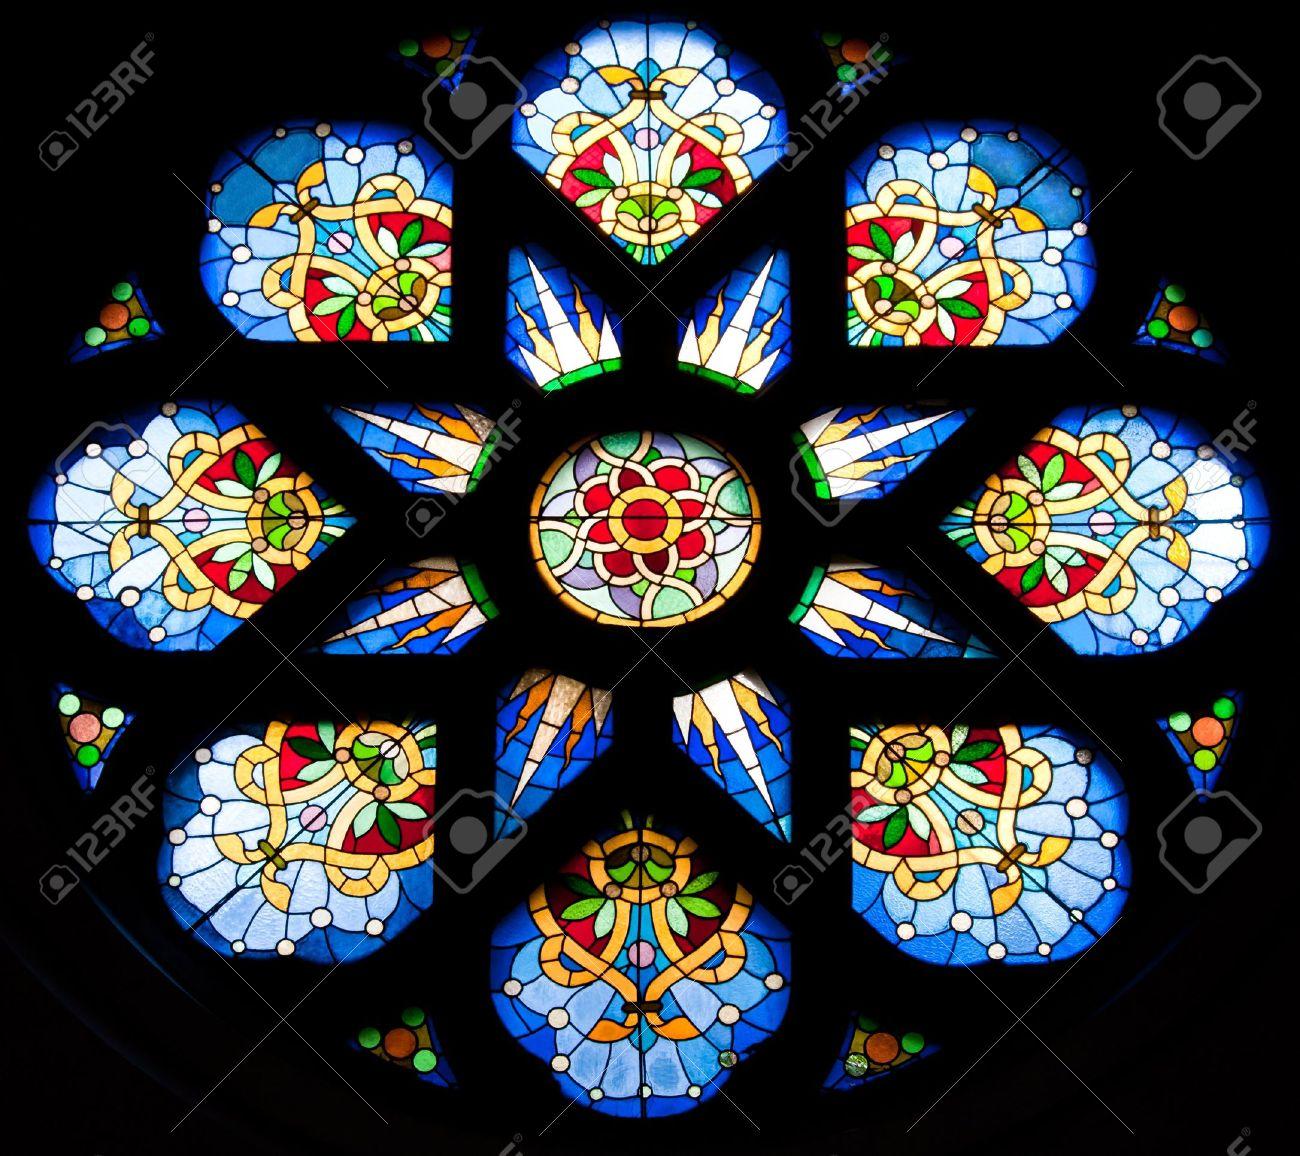 Fönster blyinfattade fönster : Blyinfattade Fönster FrÃ¥n En Kyrka I Serbien Royalty-Fria ...